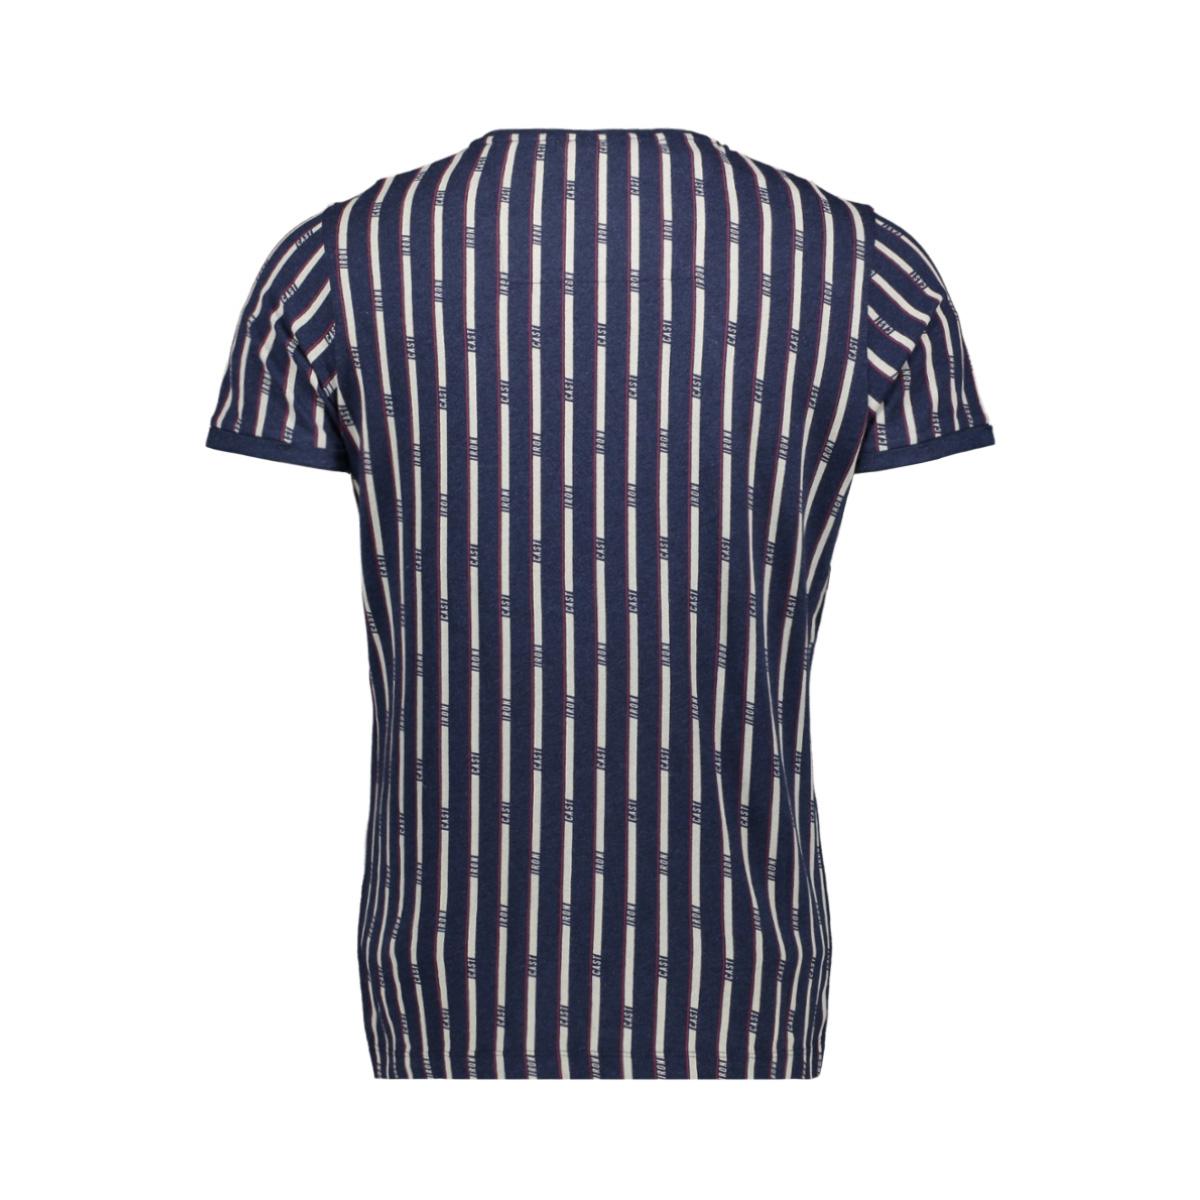 single jersey t shirt ctss202262 cast iron t-shirt 5118